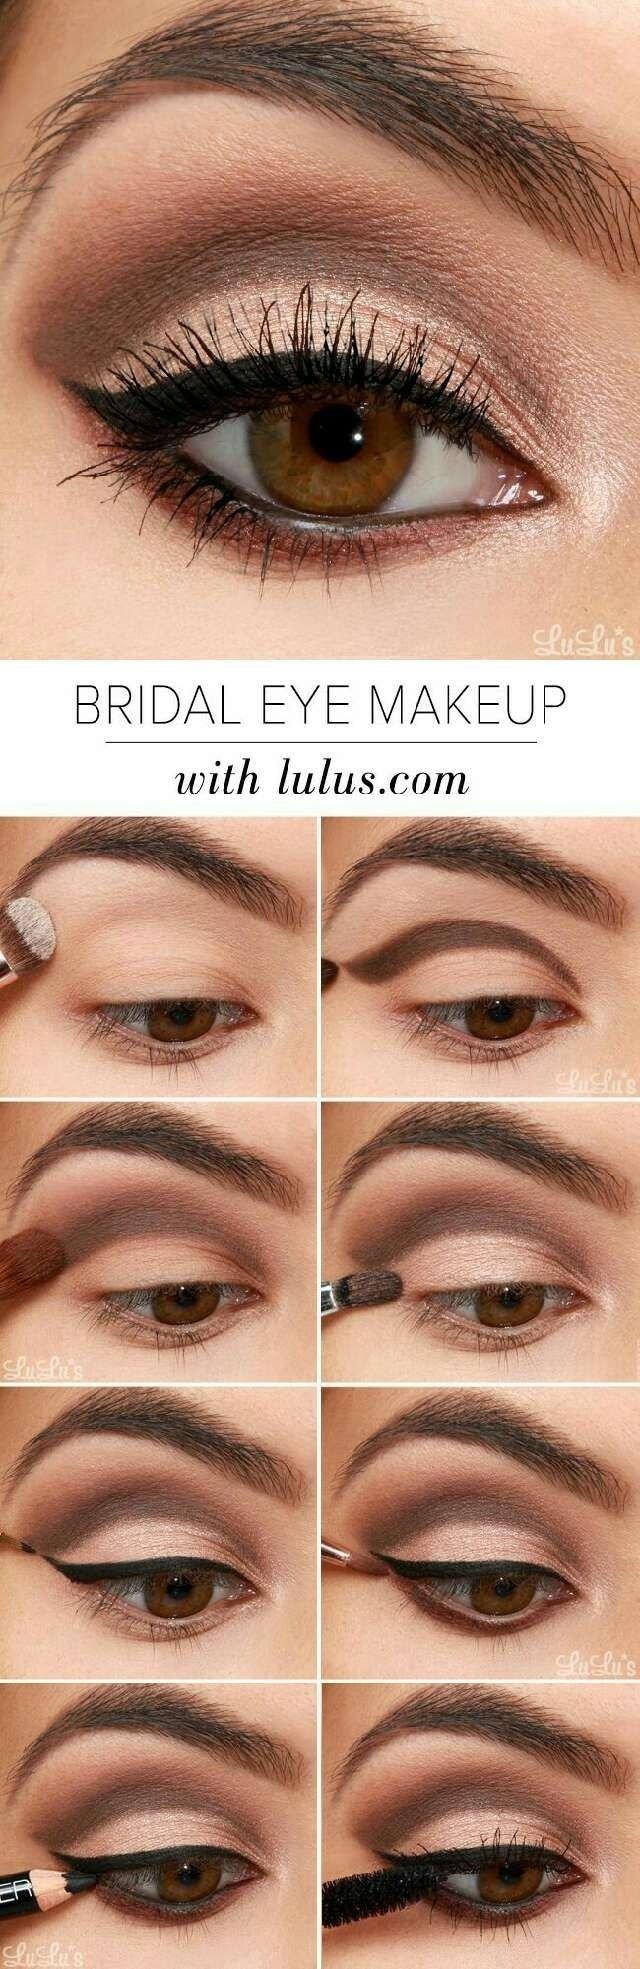 10 Best Eye Makeup Ideas Brown Eyes 17 super basic eye makeup ideas for beginners 2018 brown eyes